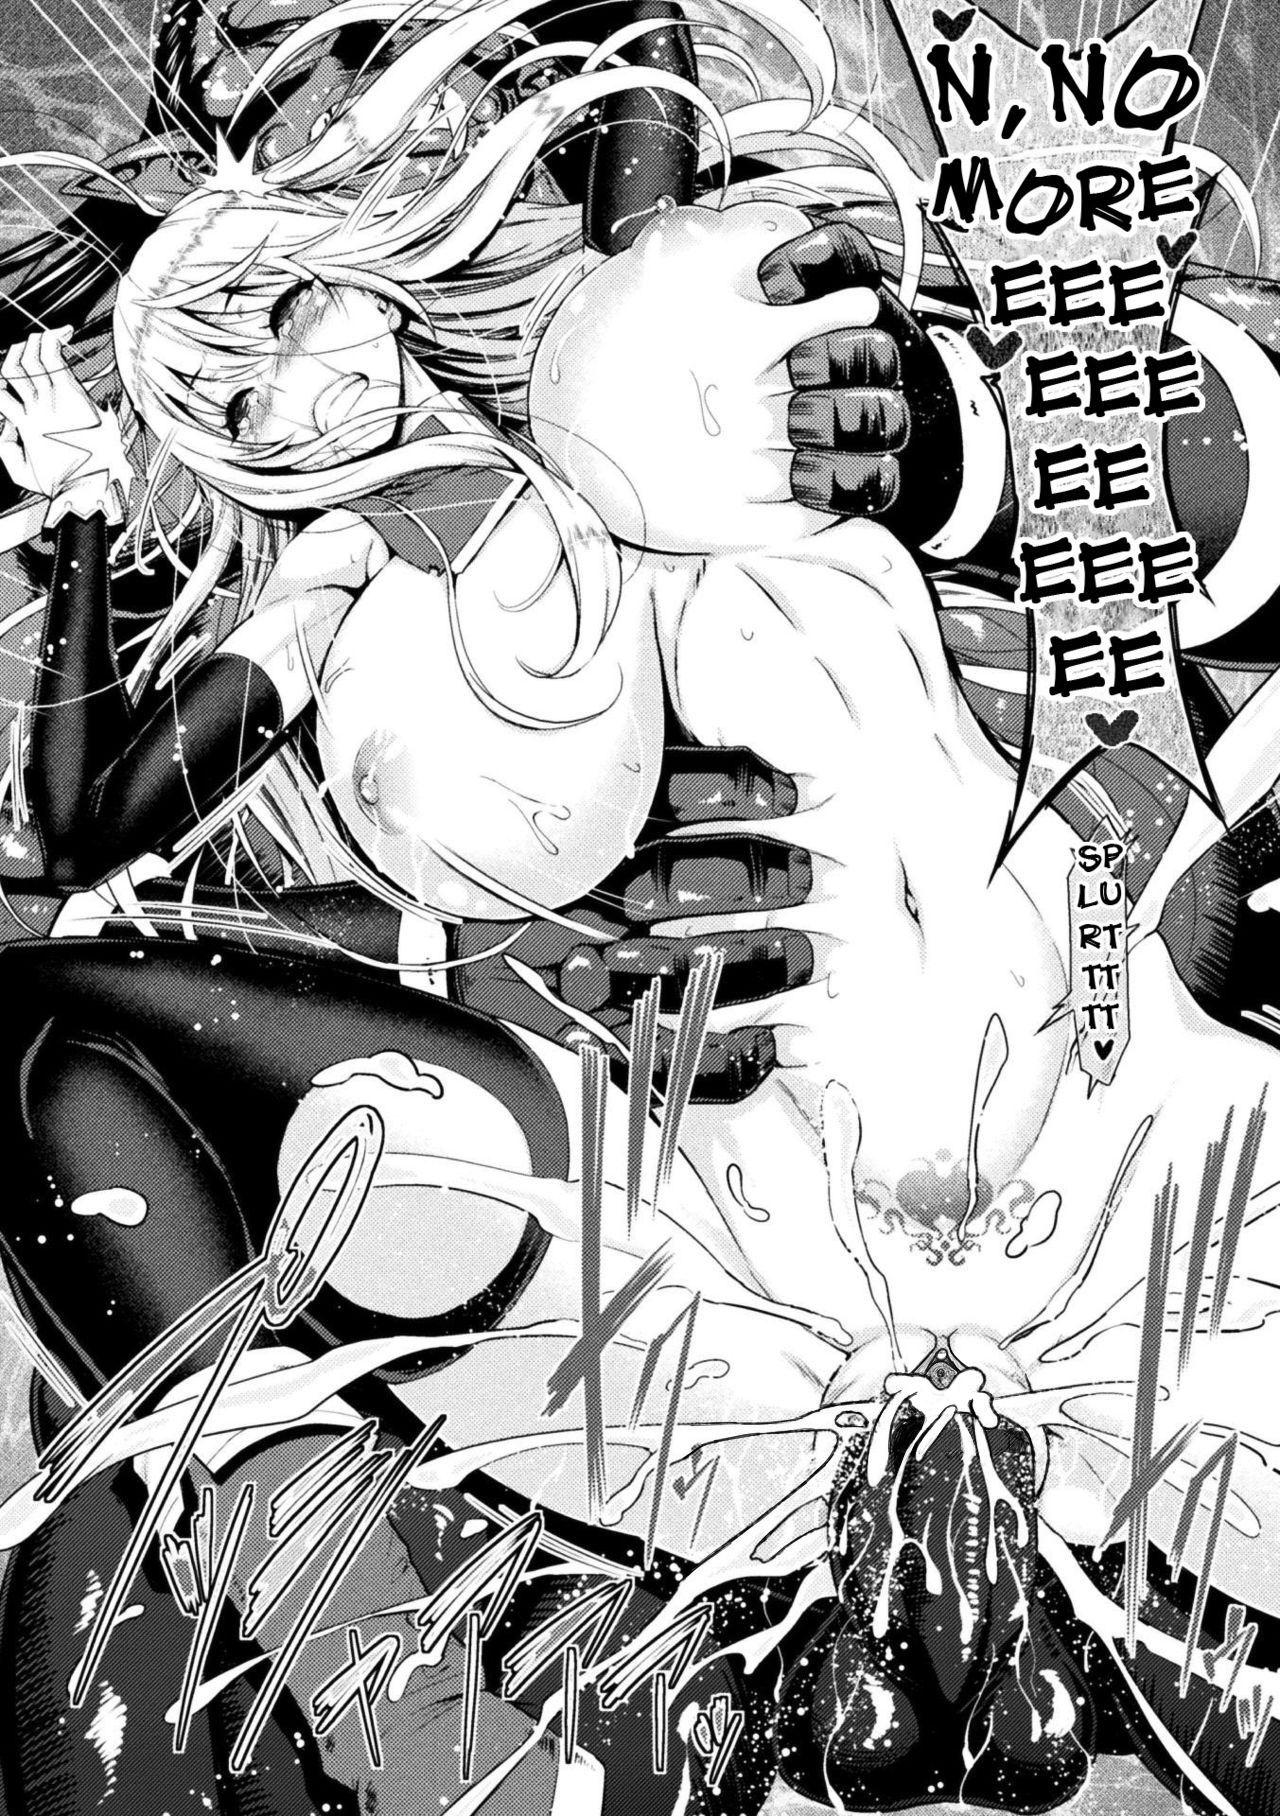 [Yamada Gogogo] Erona ~Orc no Inmon ni Okasareta Onna Kishi no Matsuro~ | Erona ~The Fall of a Beautiful Knight Cursed with the Lewd Mark of an Orc~ Ch. 1-6 [English] [darknight] [Decensored] [ongoing] 45